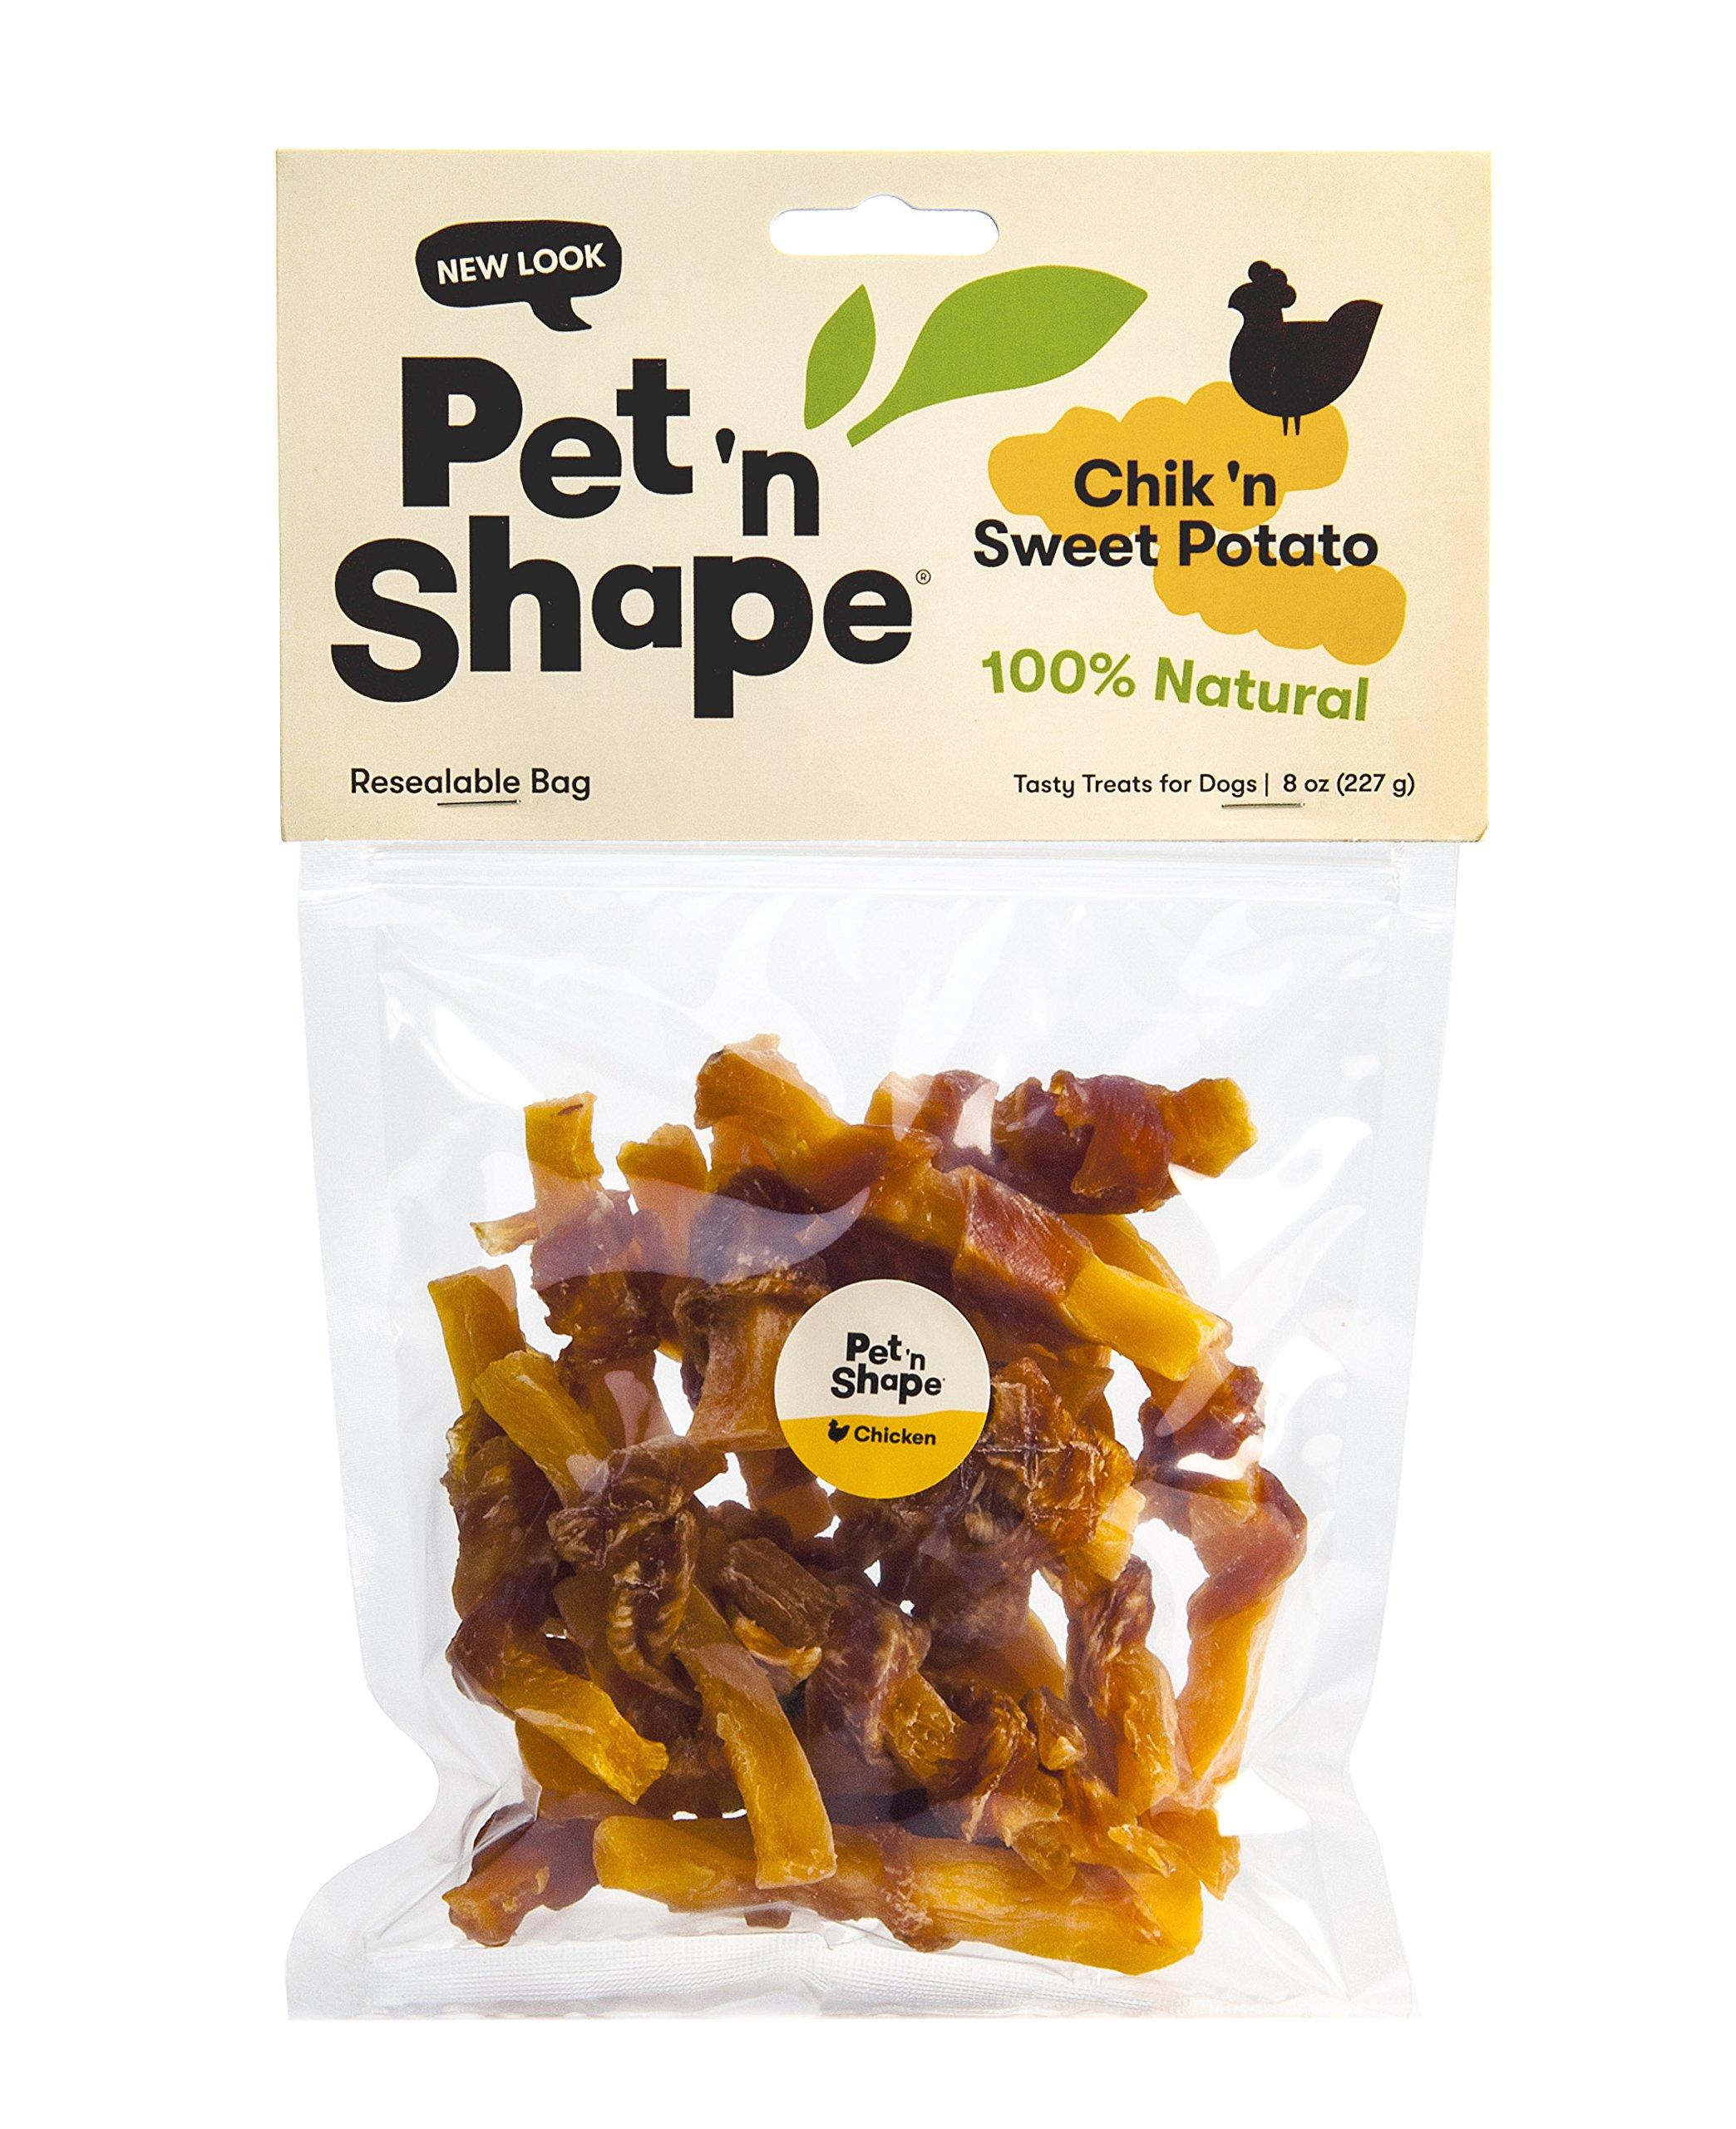 Pet 'n Shape Chik 'N Sweet Potato - All Natural Dog Treats, Chicken, 8 oz